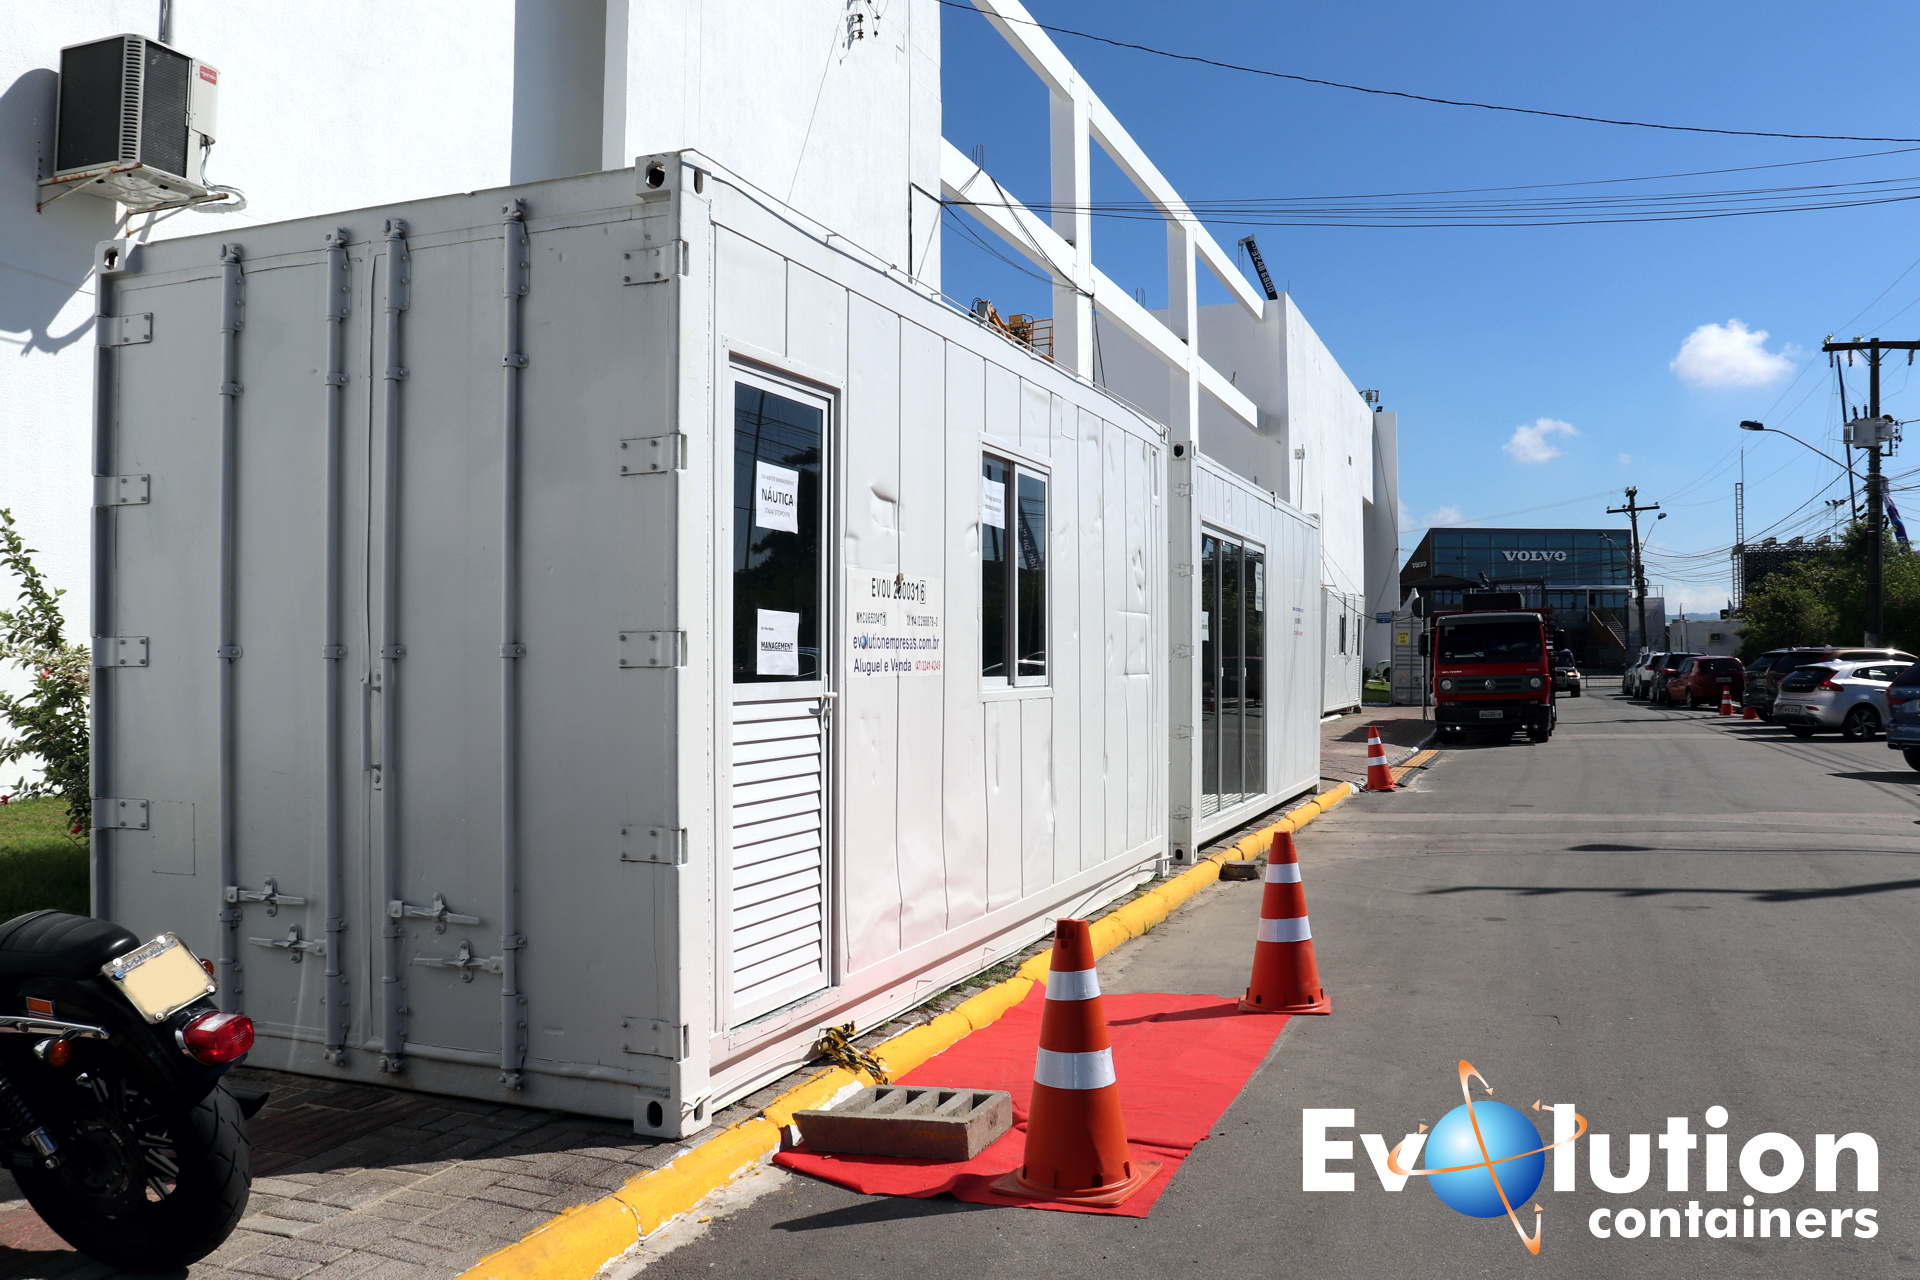 #volvoocean #volvooceanrace #volvoitajai2018 #evolutioncontainers #containers